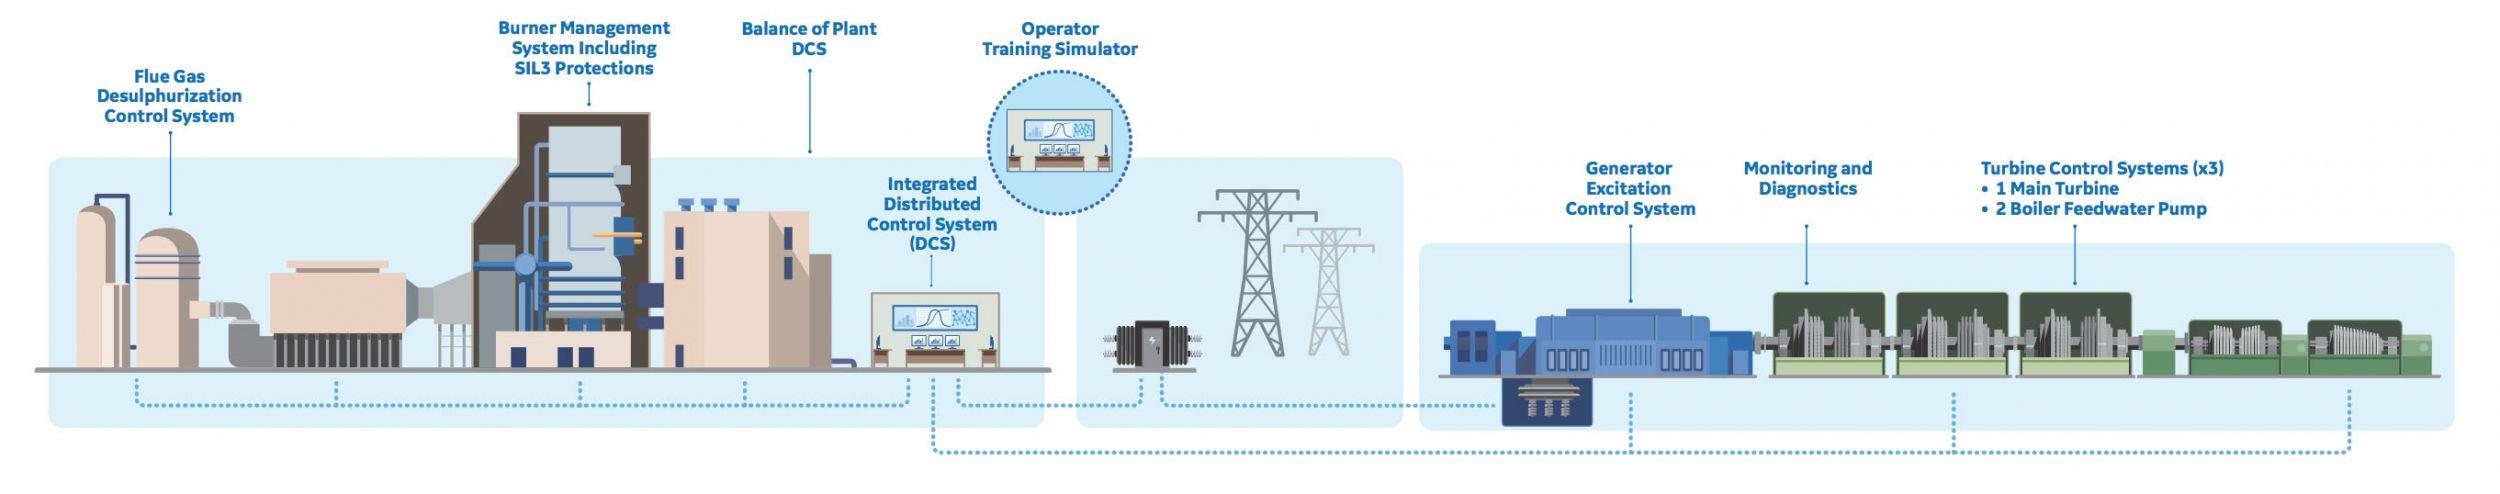 Turbine Control System | GE Power